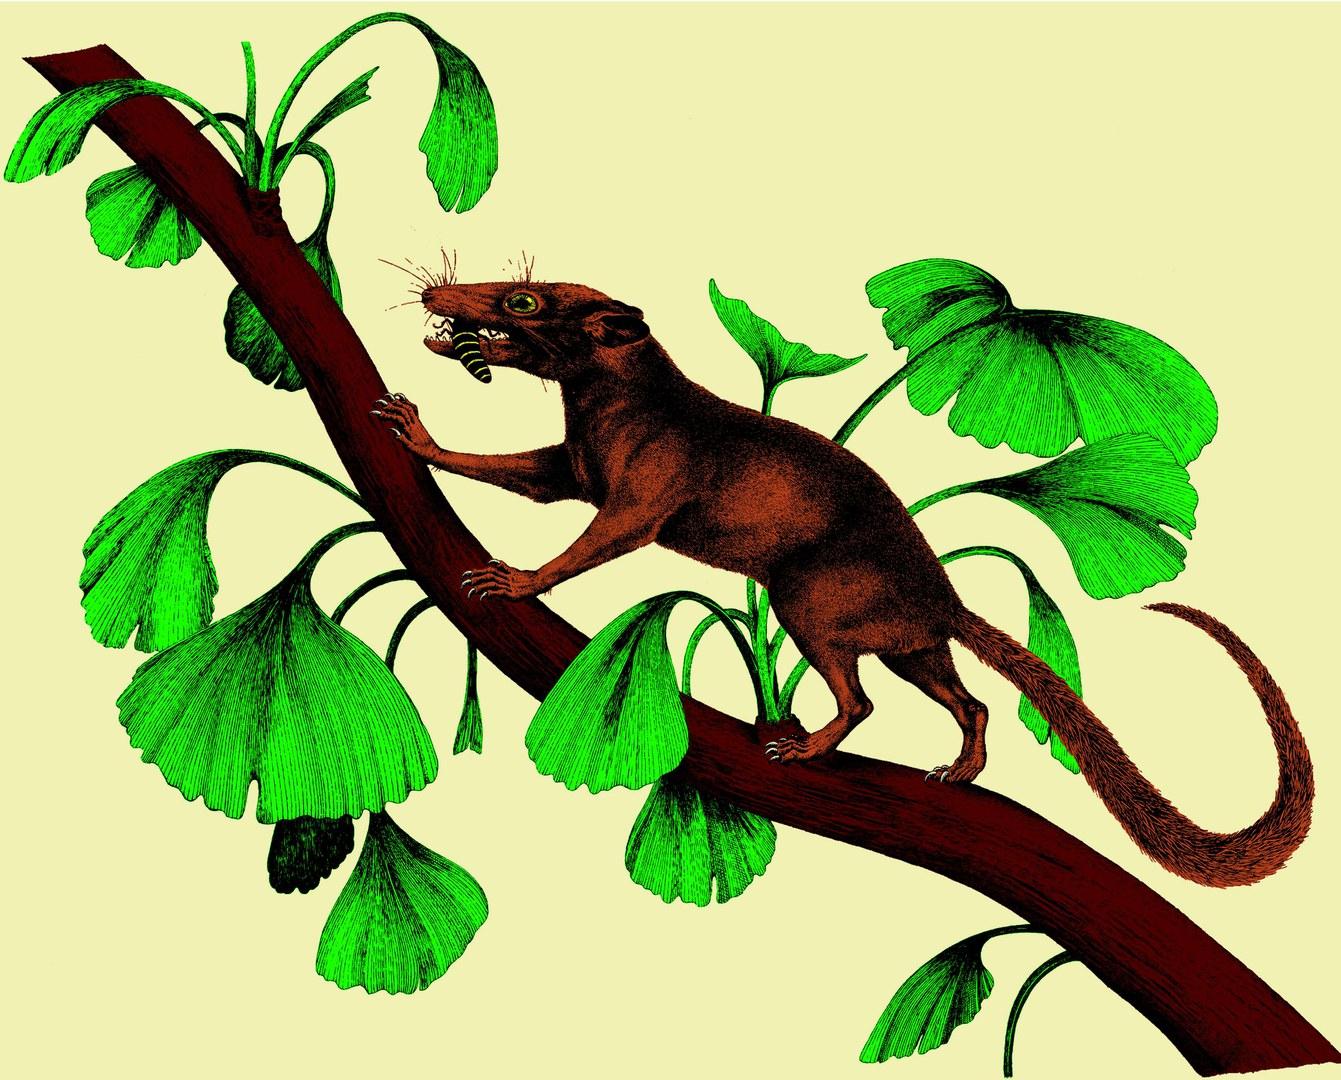 Bild Daumengroßes Ursäugetier als Fossil des Monats